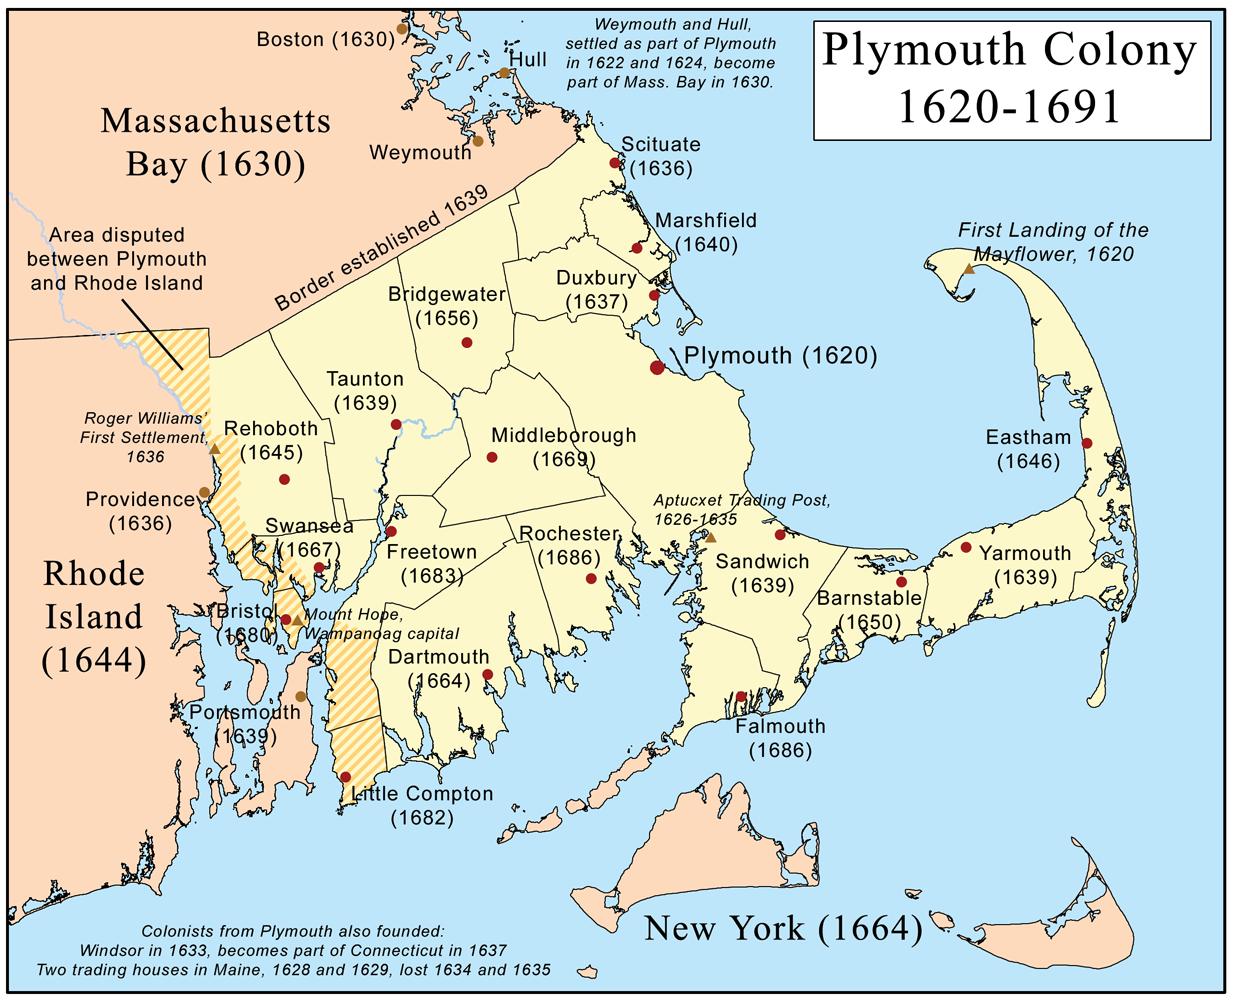 Massachusetts Rhode Island Boundary Dispute